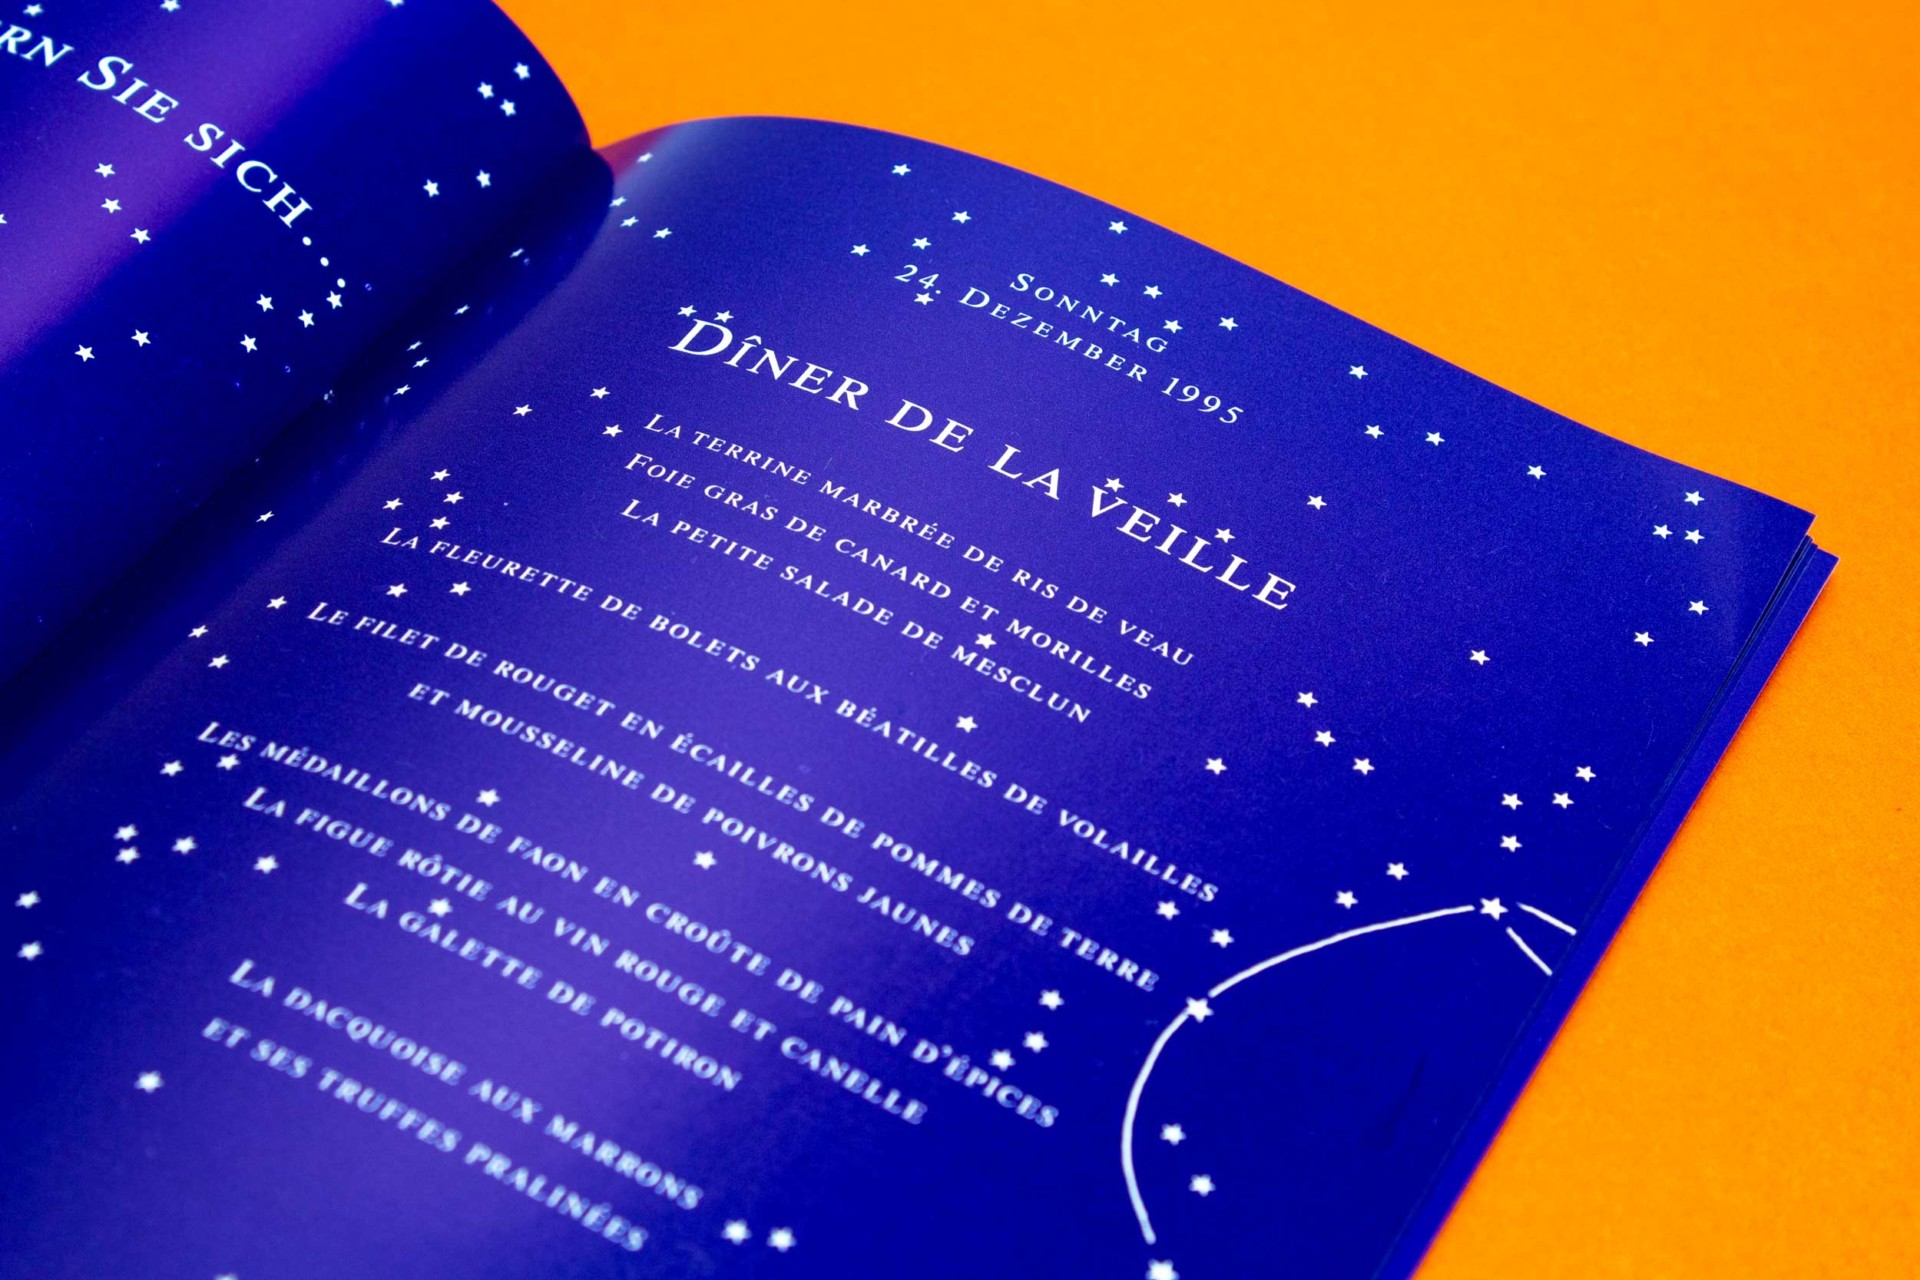 BKVK Hotel Les Trois Rois — Broschüre